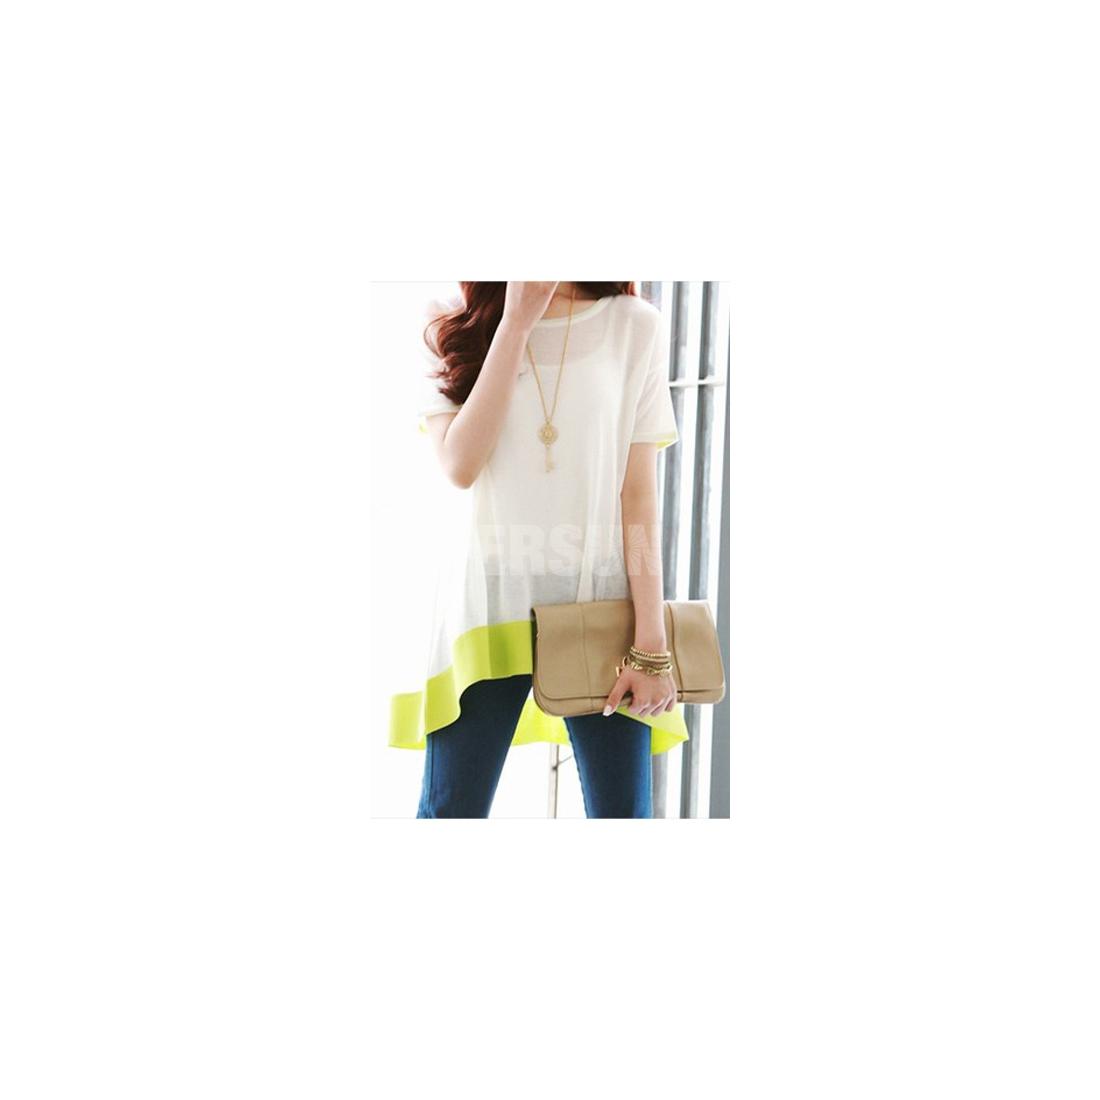 Neon Color Wedge White Chiffon Tee [FCBI00239]- US$ 28.99 - PersunMall.com